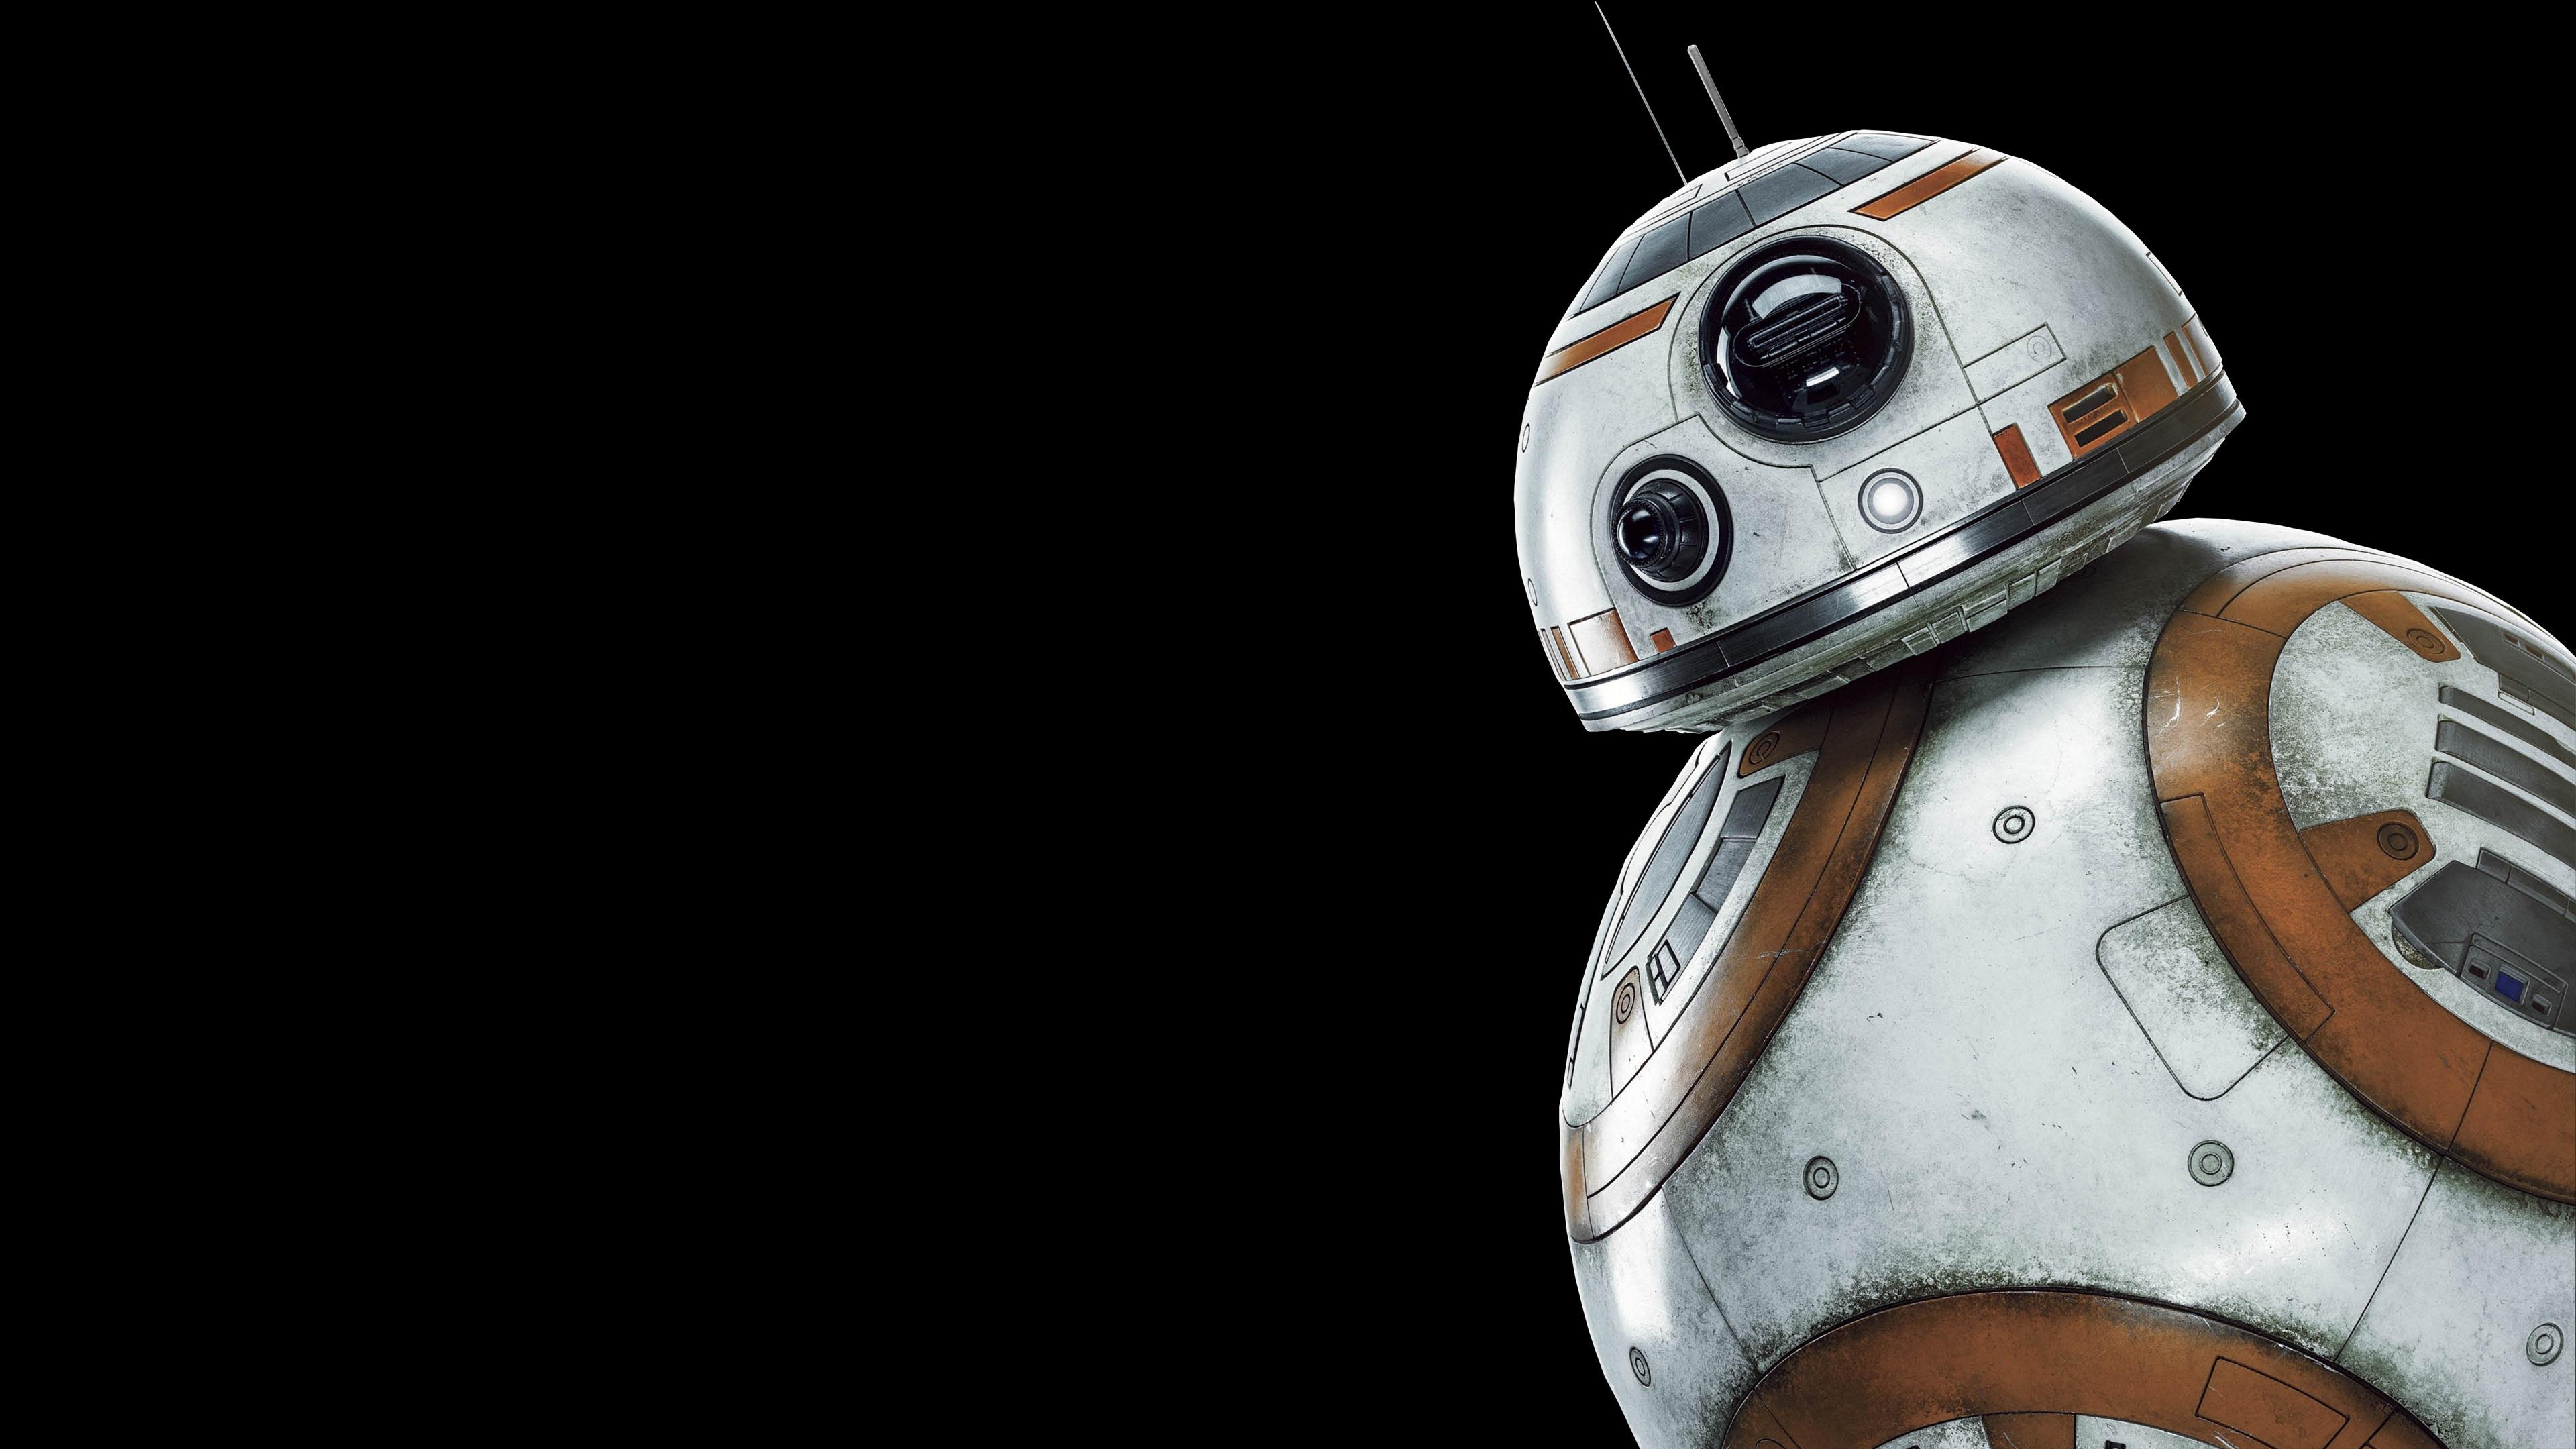 Wallpaper BB8 robot Star Wars 3840x2160 UHD 4K Picture Image 3840x2160